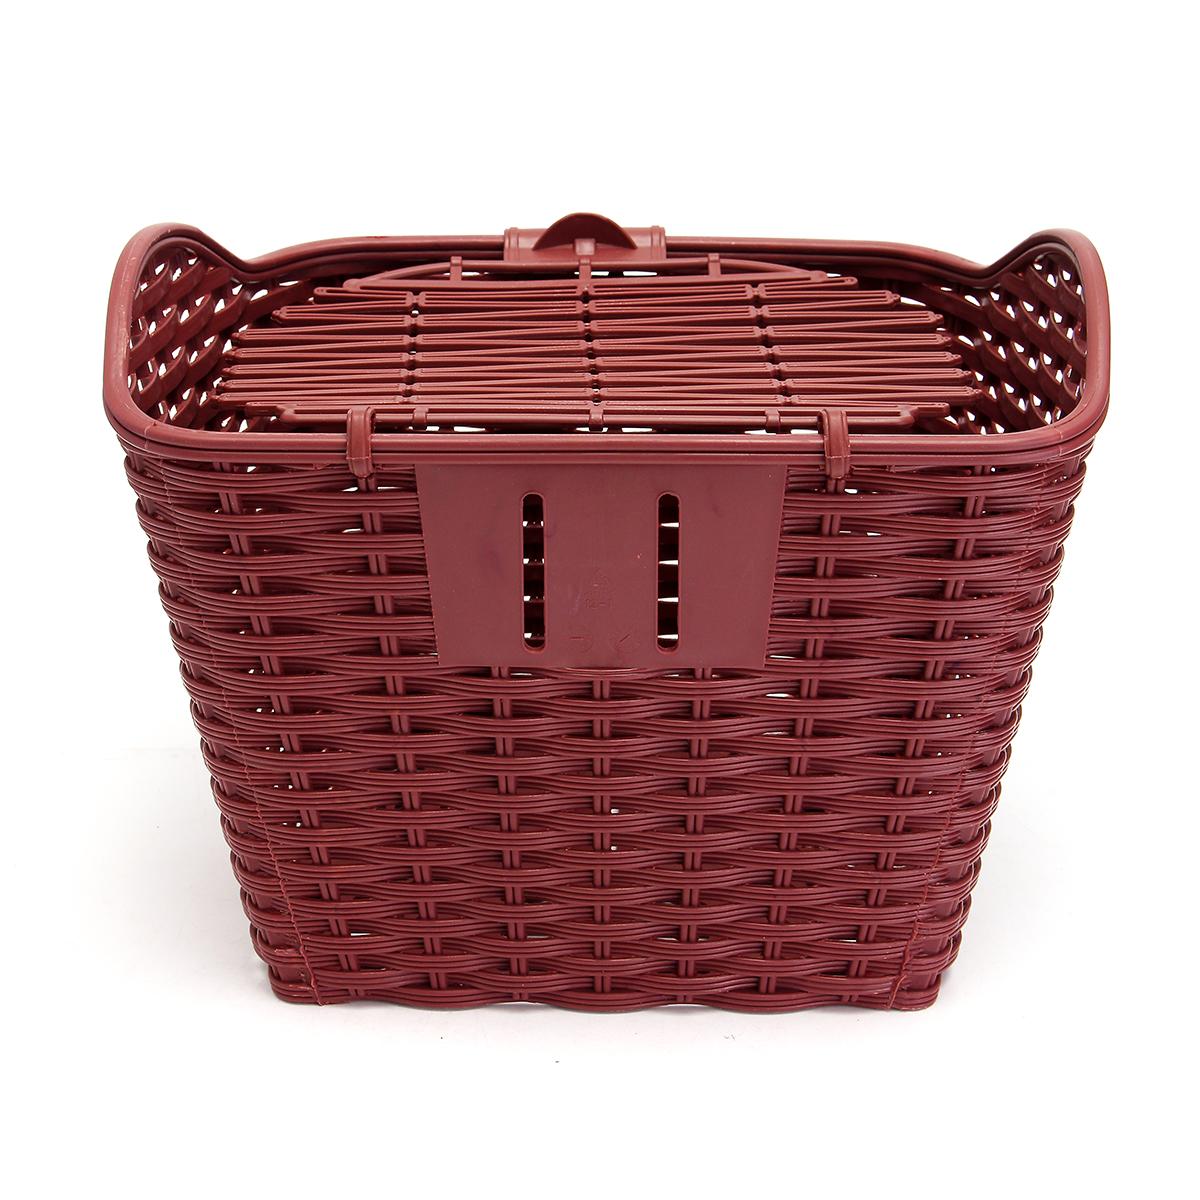 Scooter Bike Plastic Weaving Basket Removable Shopping Storage Holder